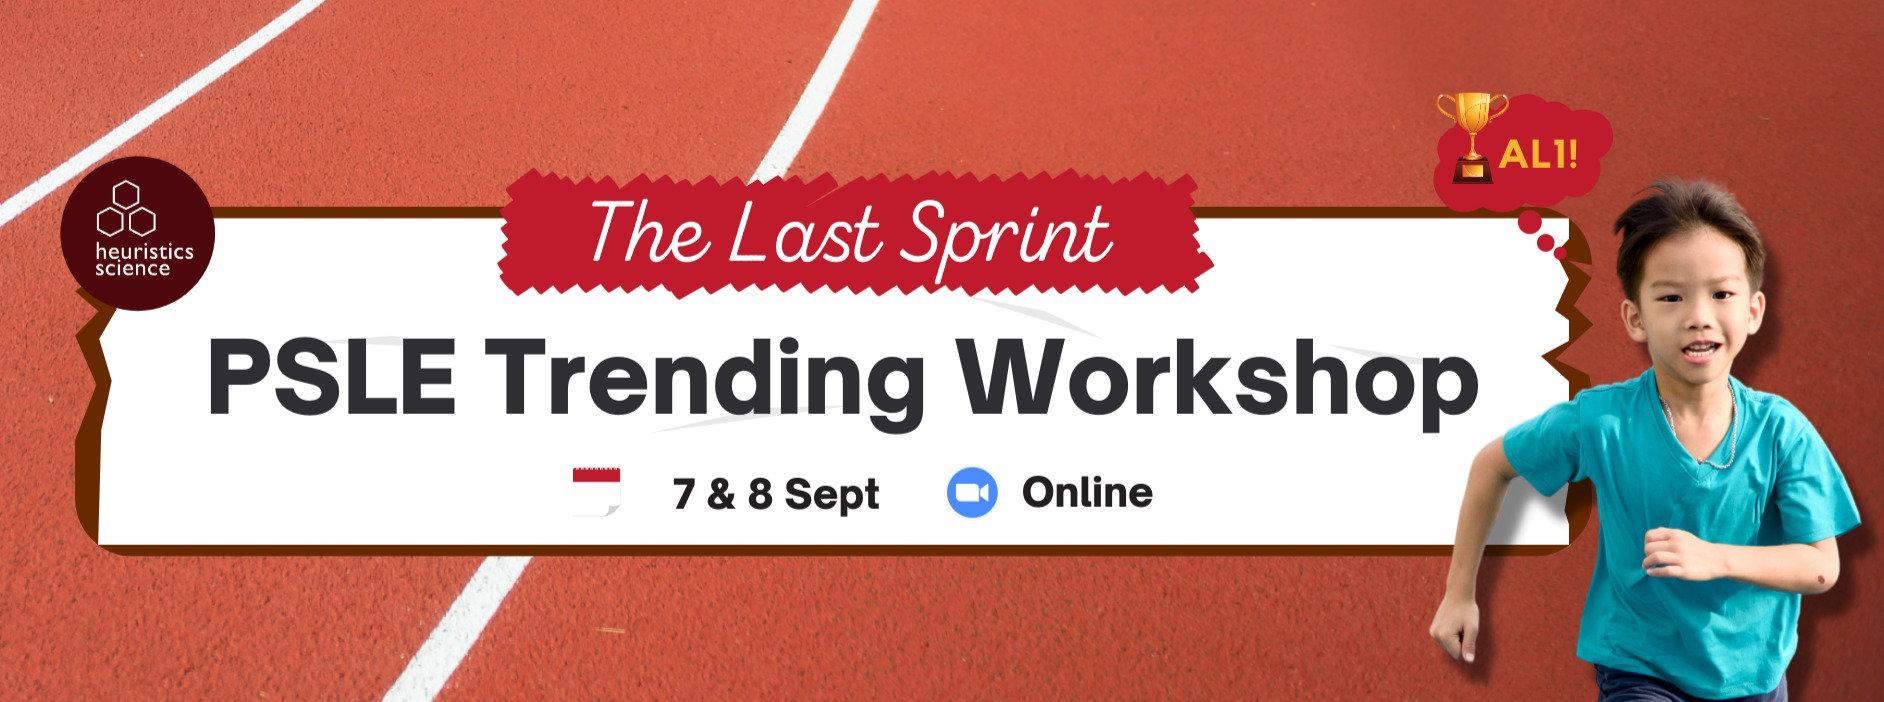 The Last Sprint: PSLE Trending Workshop